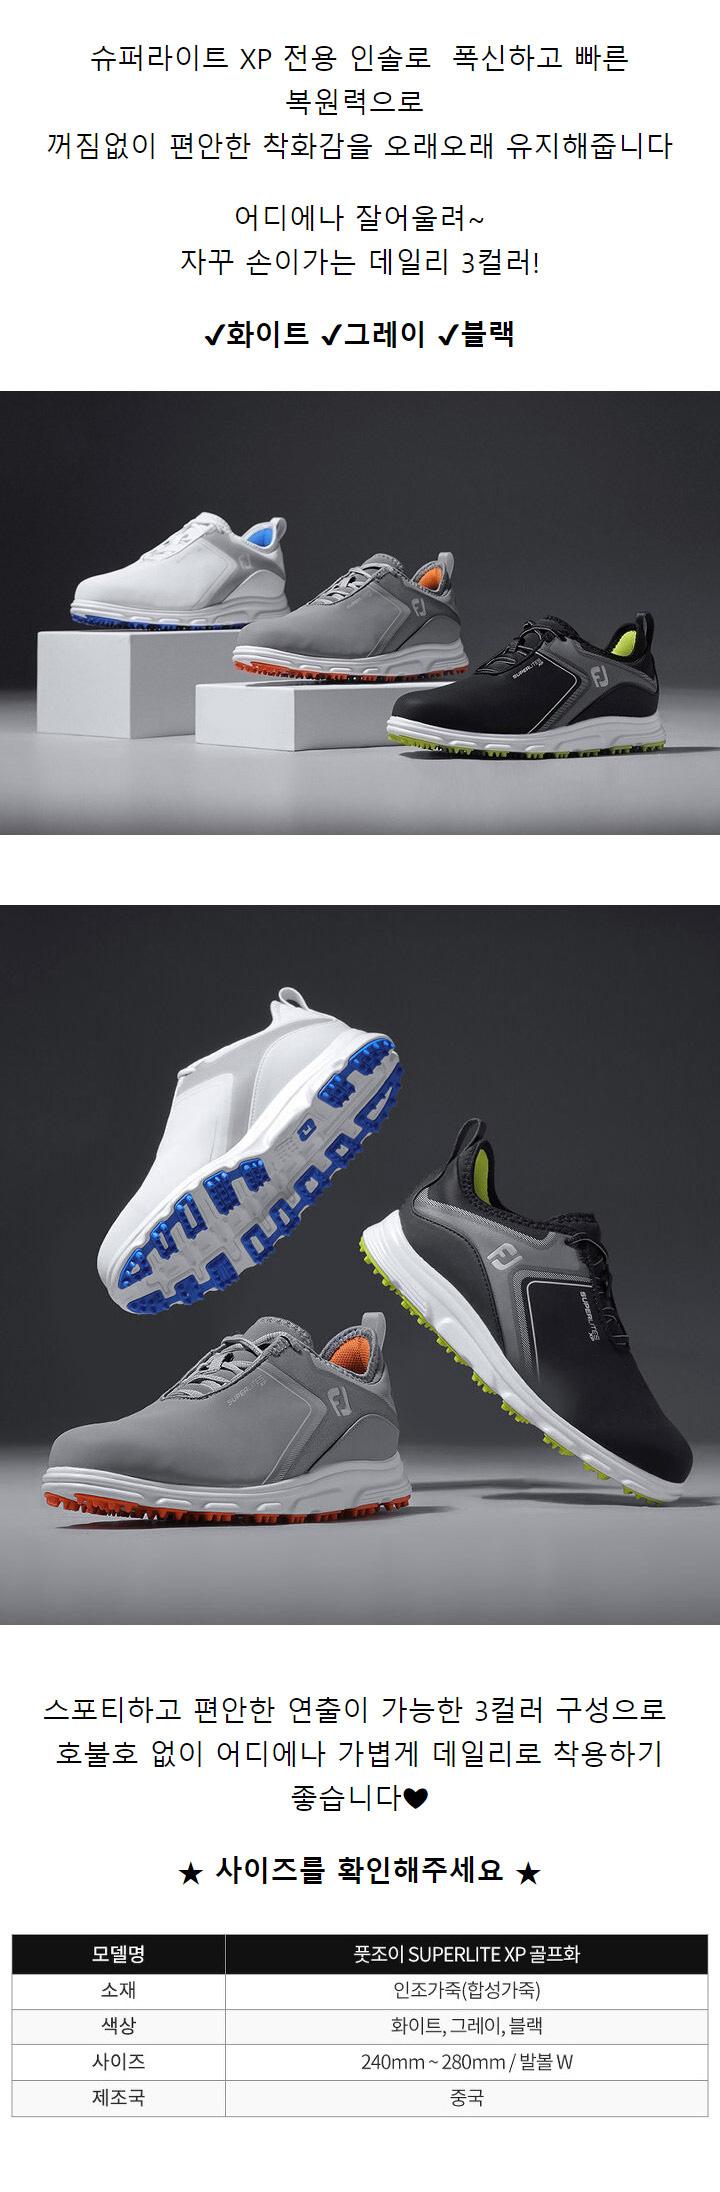 footjoy_superlitse_xp_race_shoes_21_23.jpg